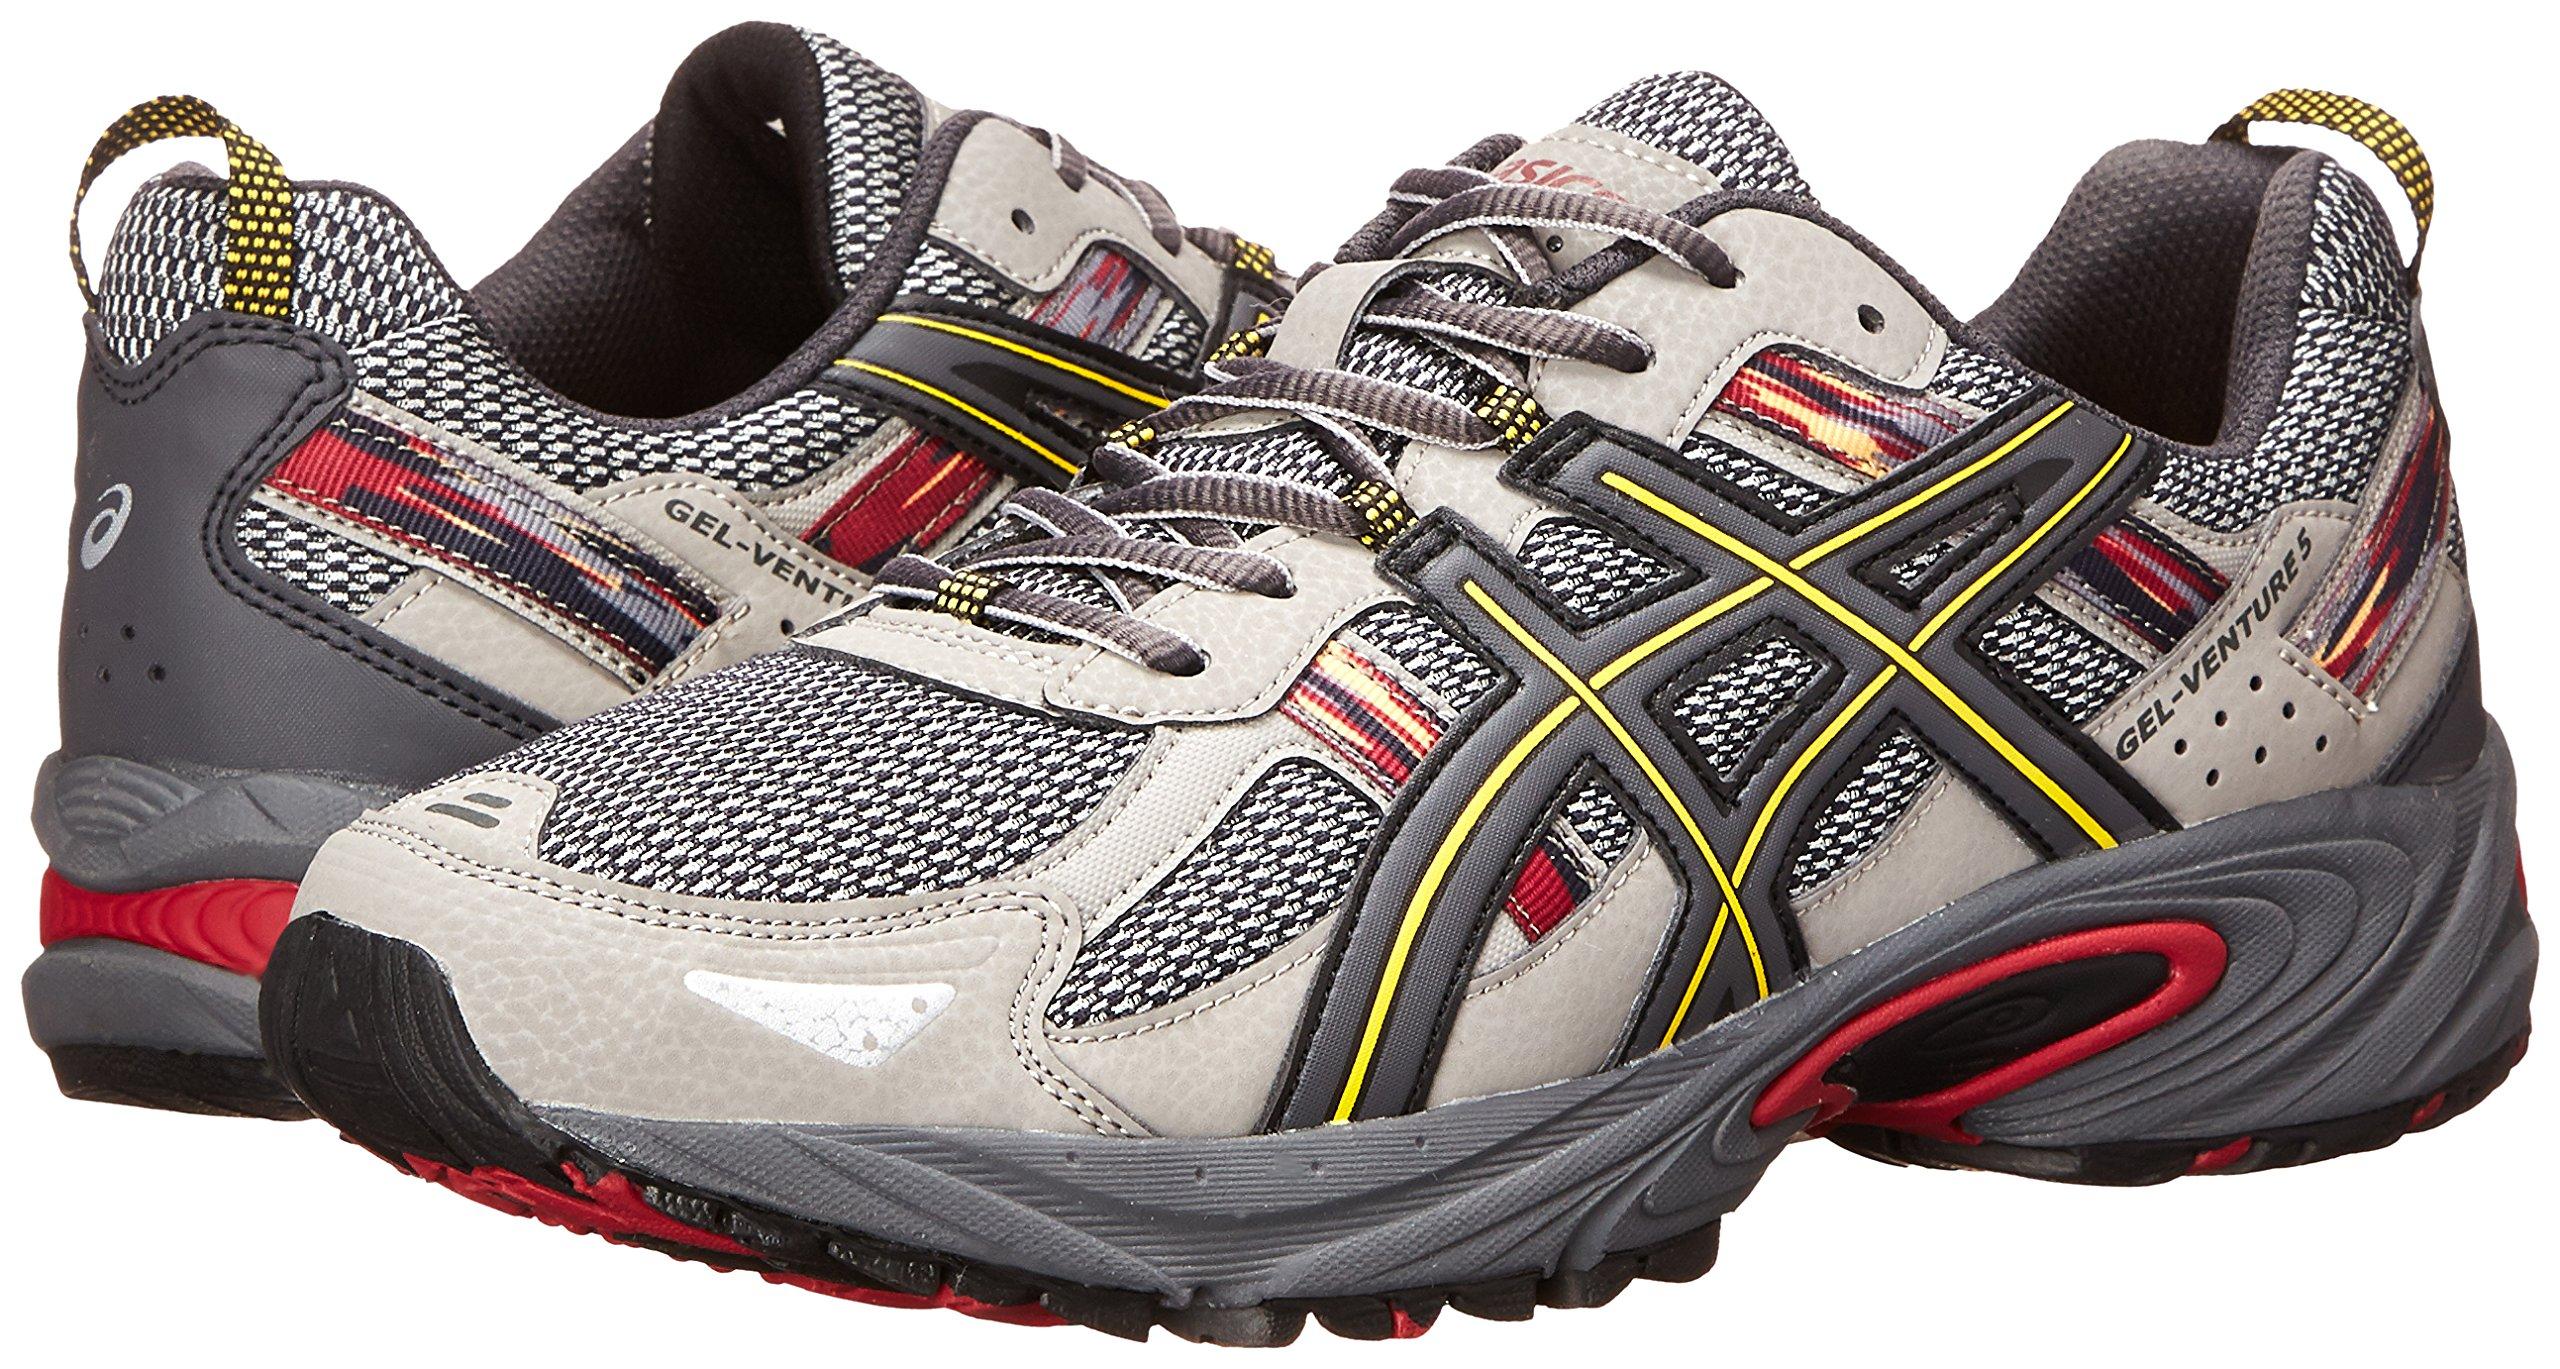 b9e059e66ffc ASICS Men s GEL Venture 5 Running Shoe - GEL-Venture 5-M   Running Shoes    Sneakers   Products - tibs